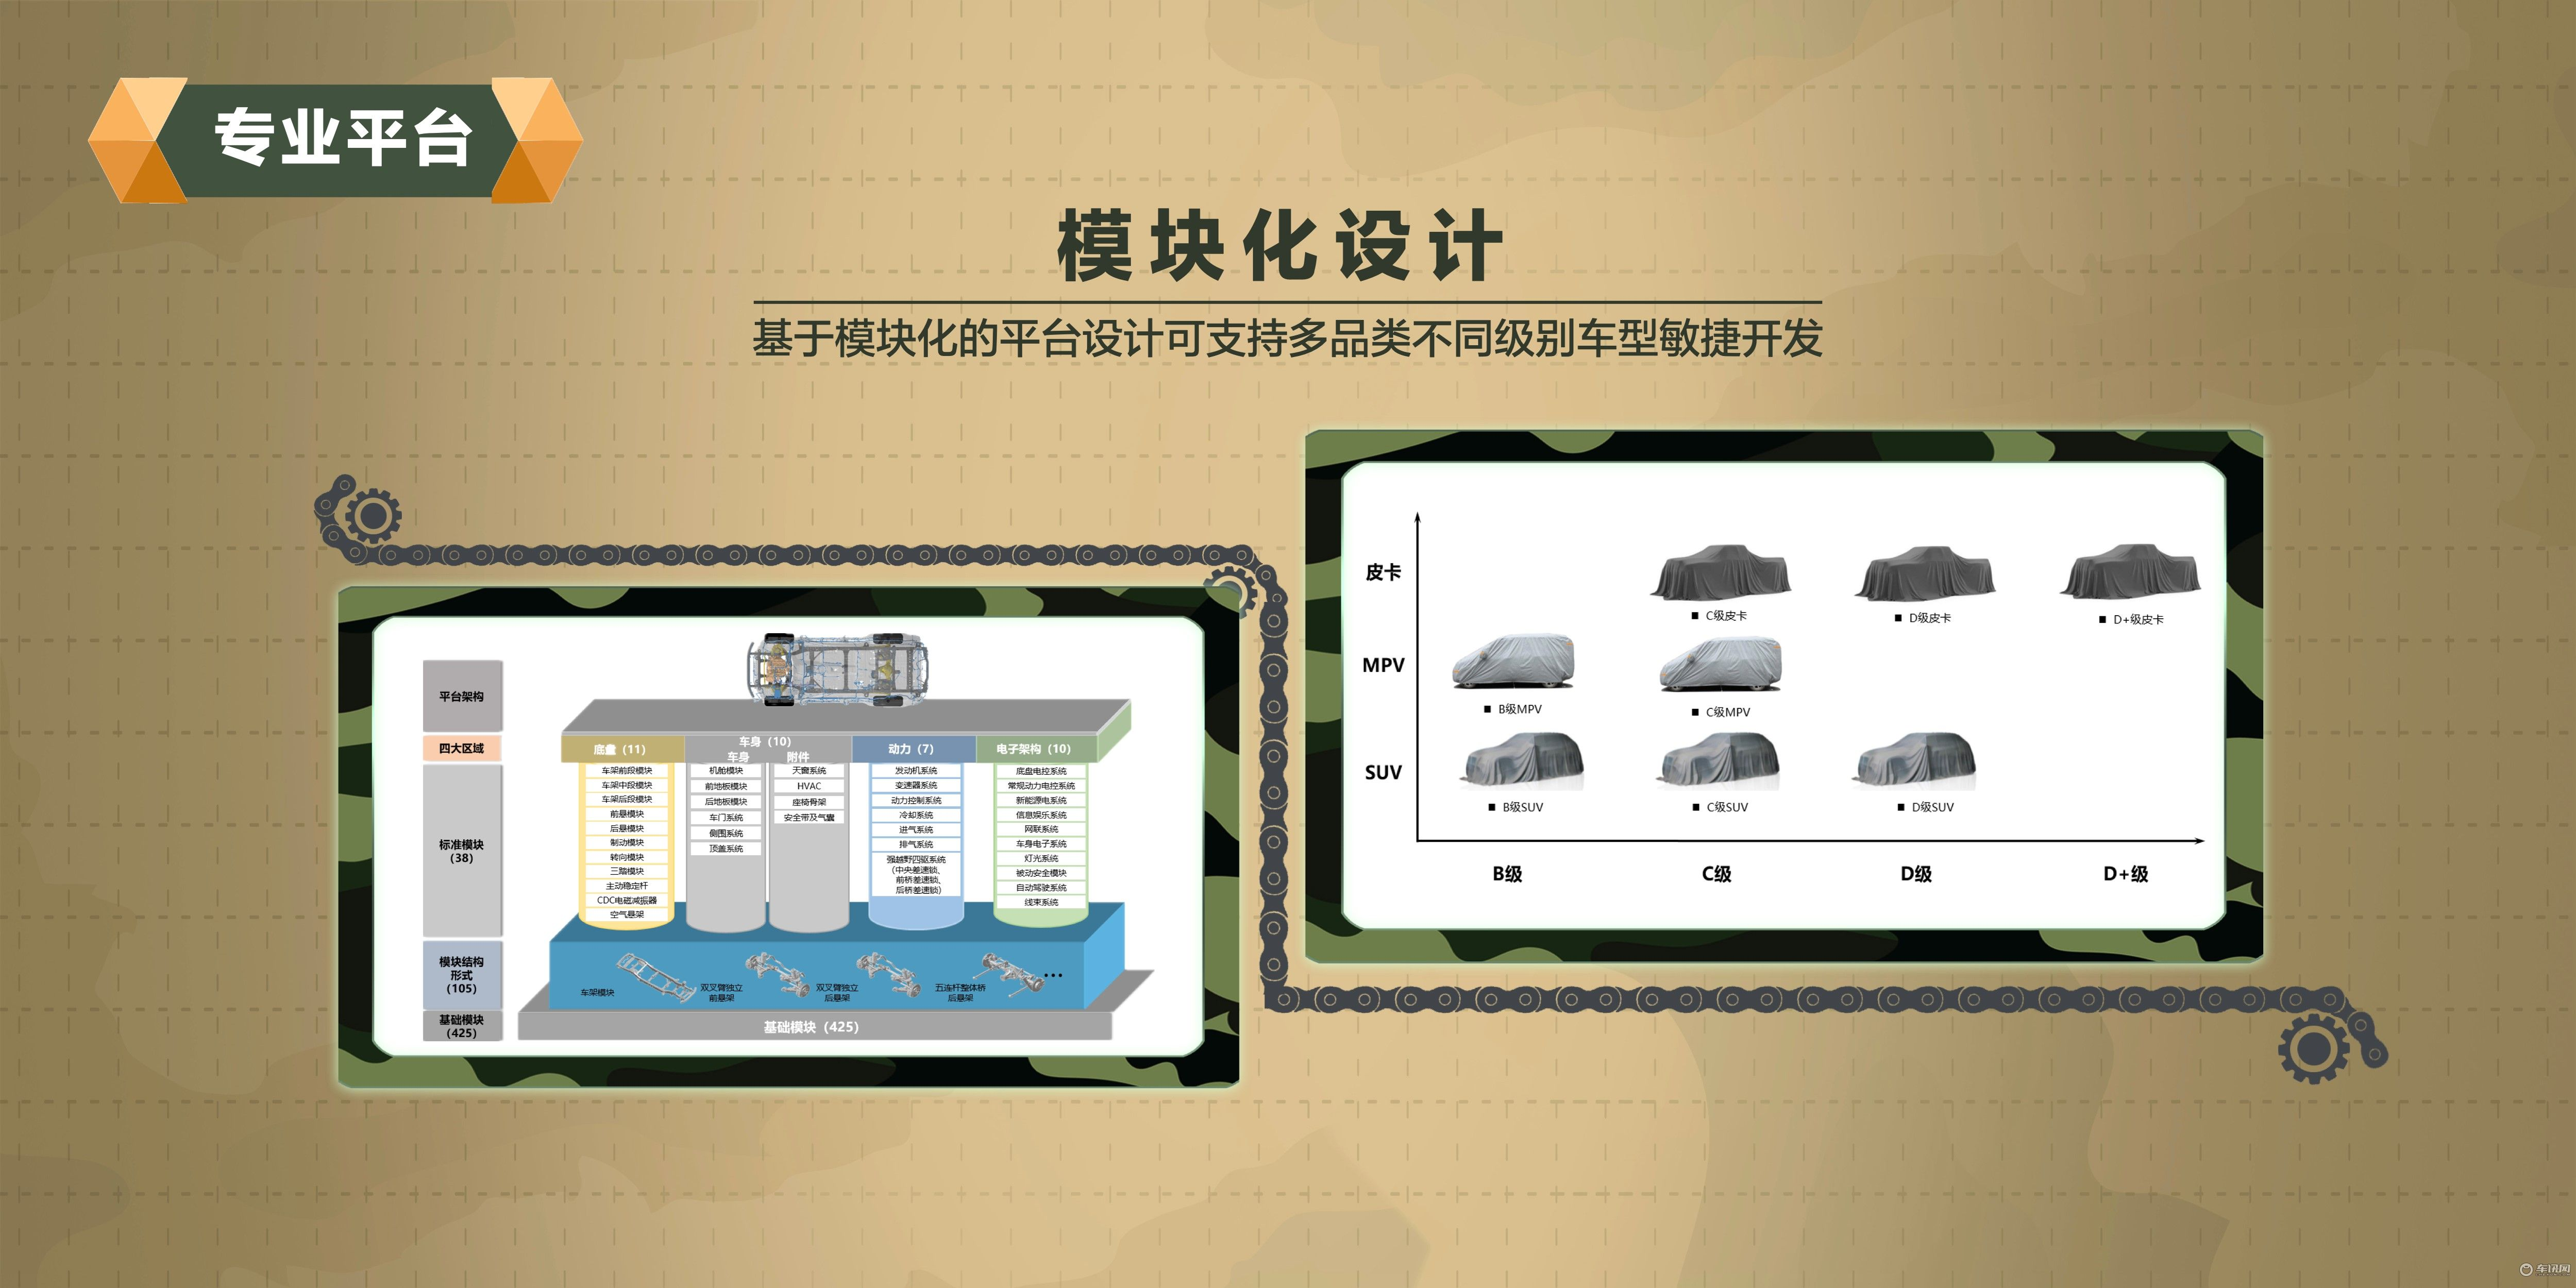 750N·m動力/38%熱效率,坦克平臺技術揭秘